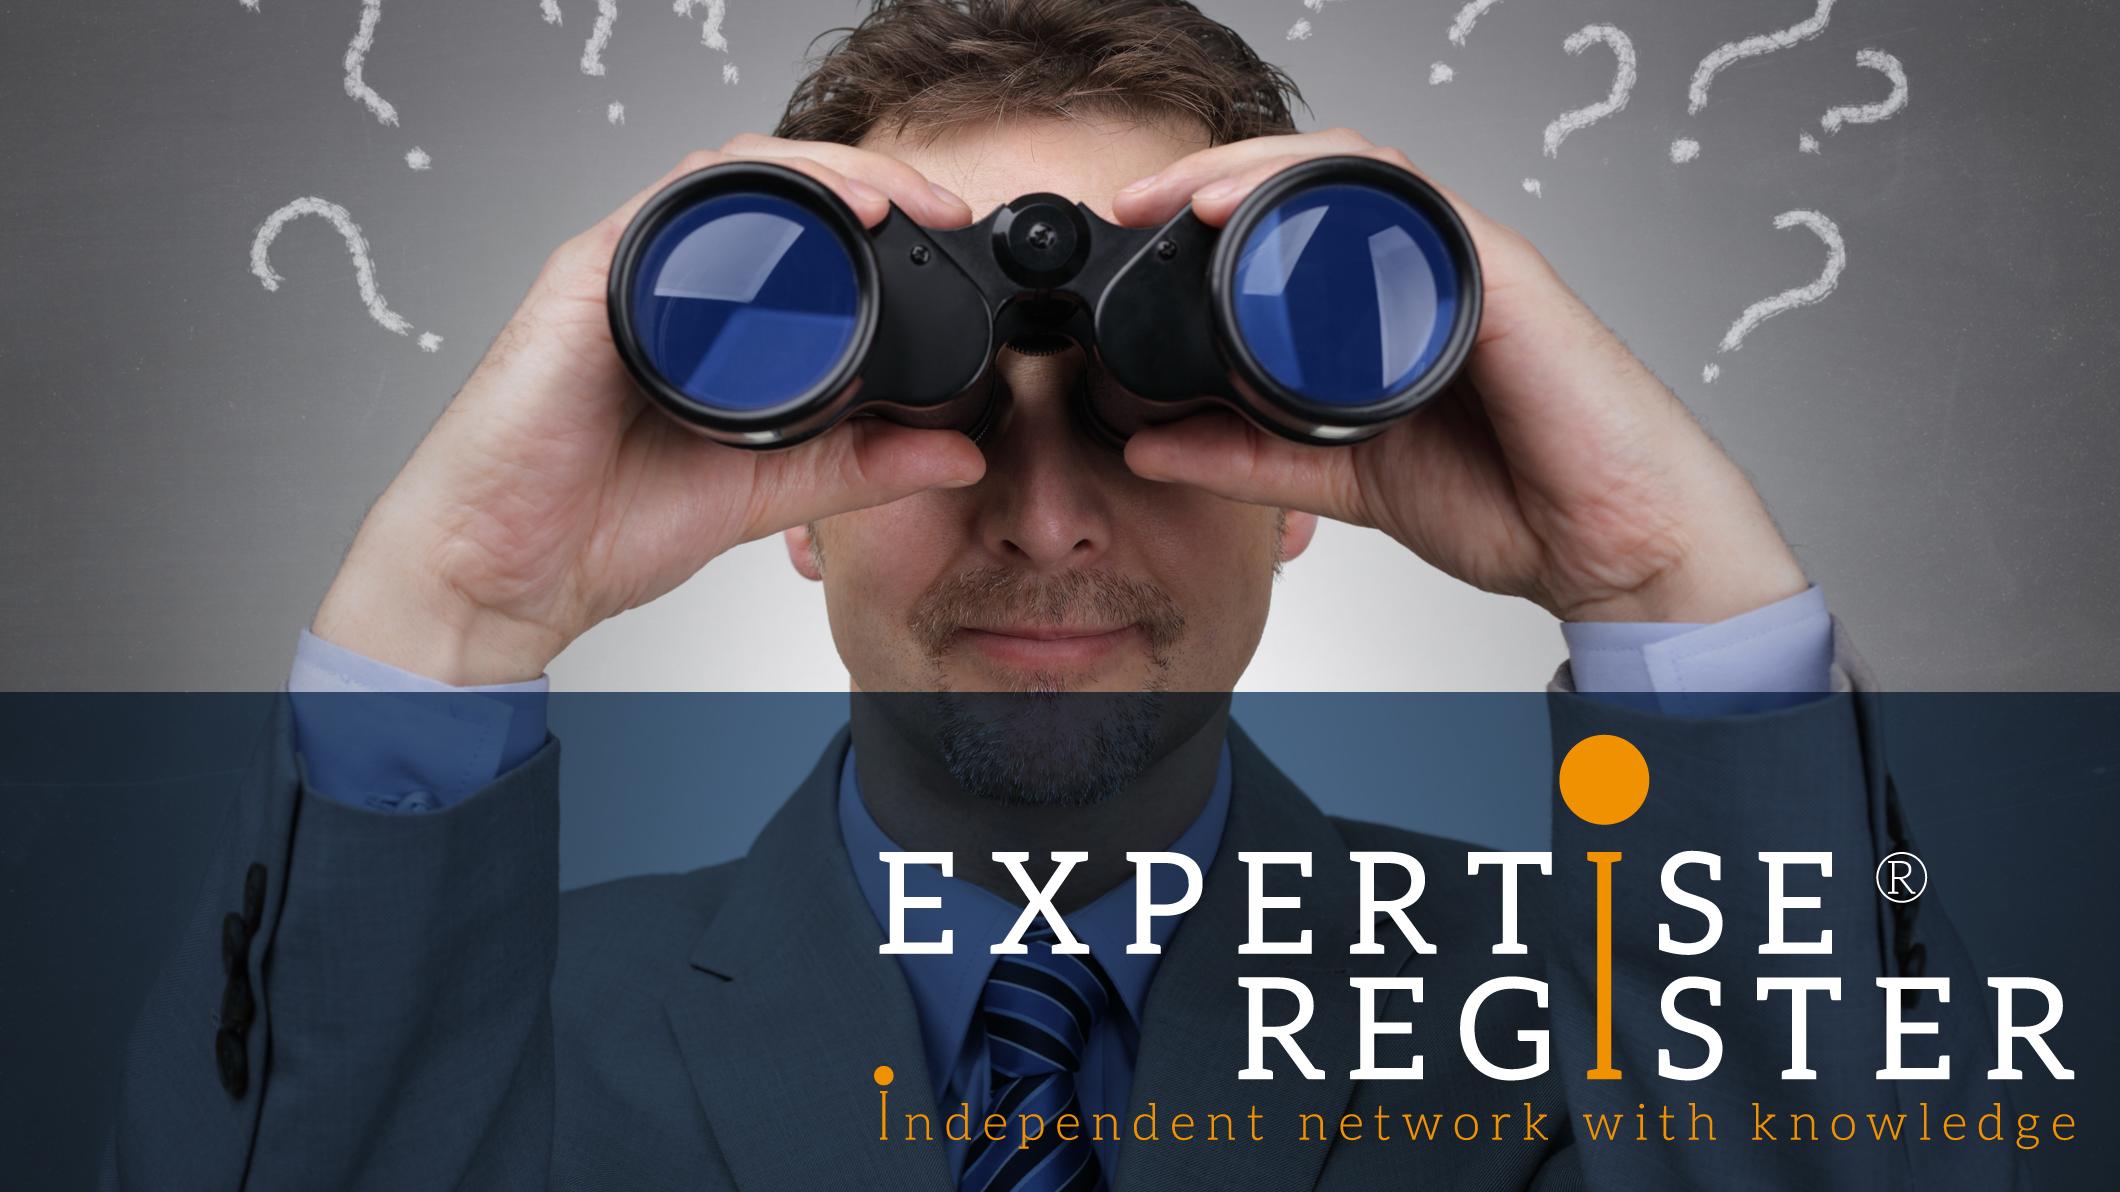 Experts gezocht